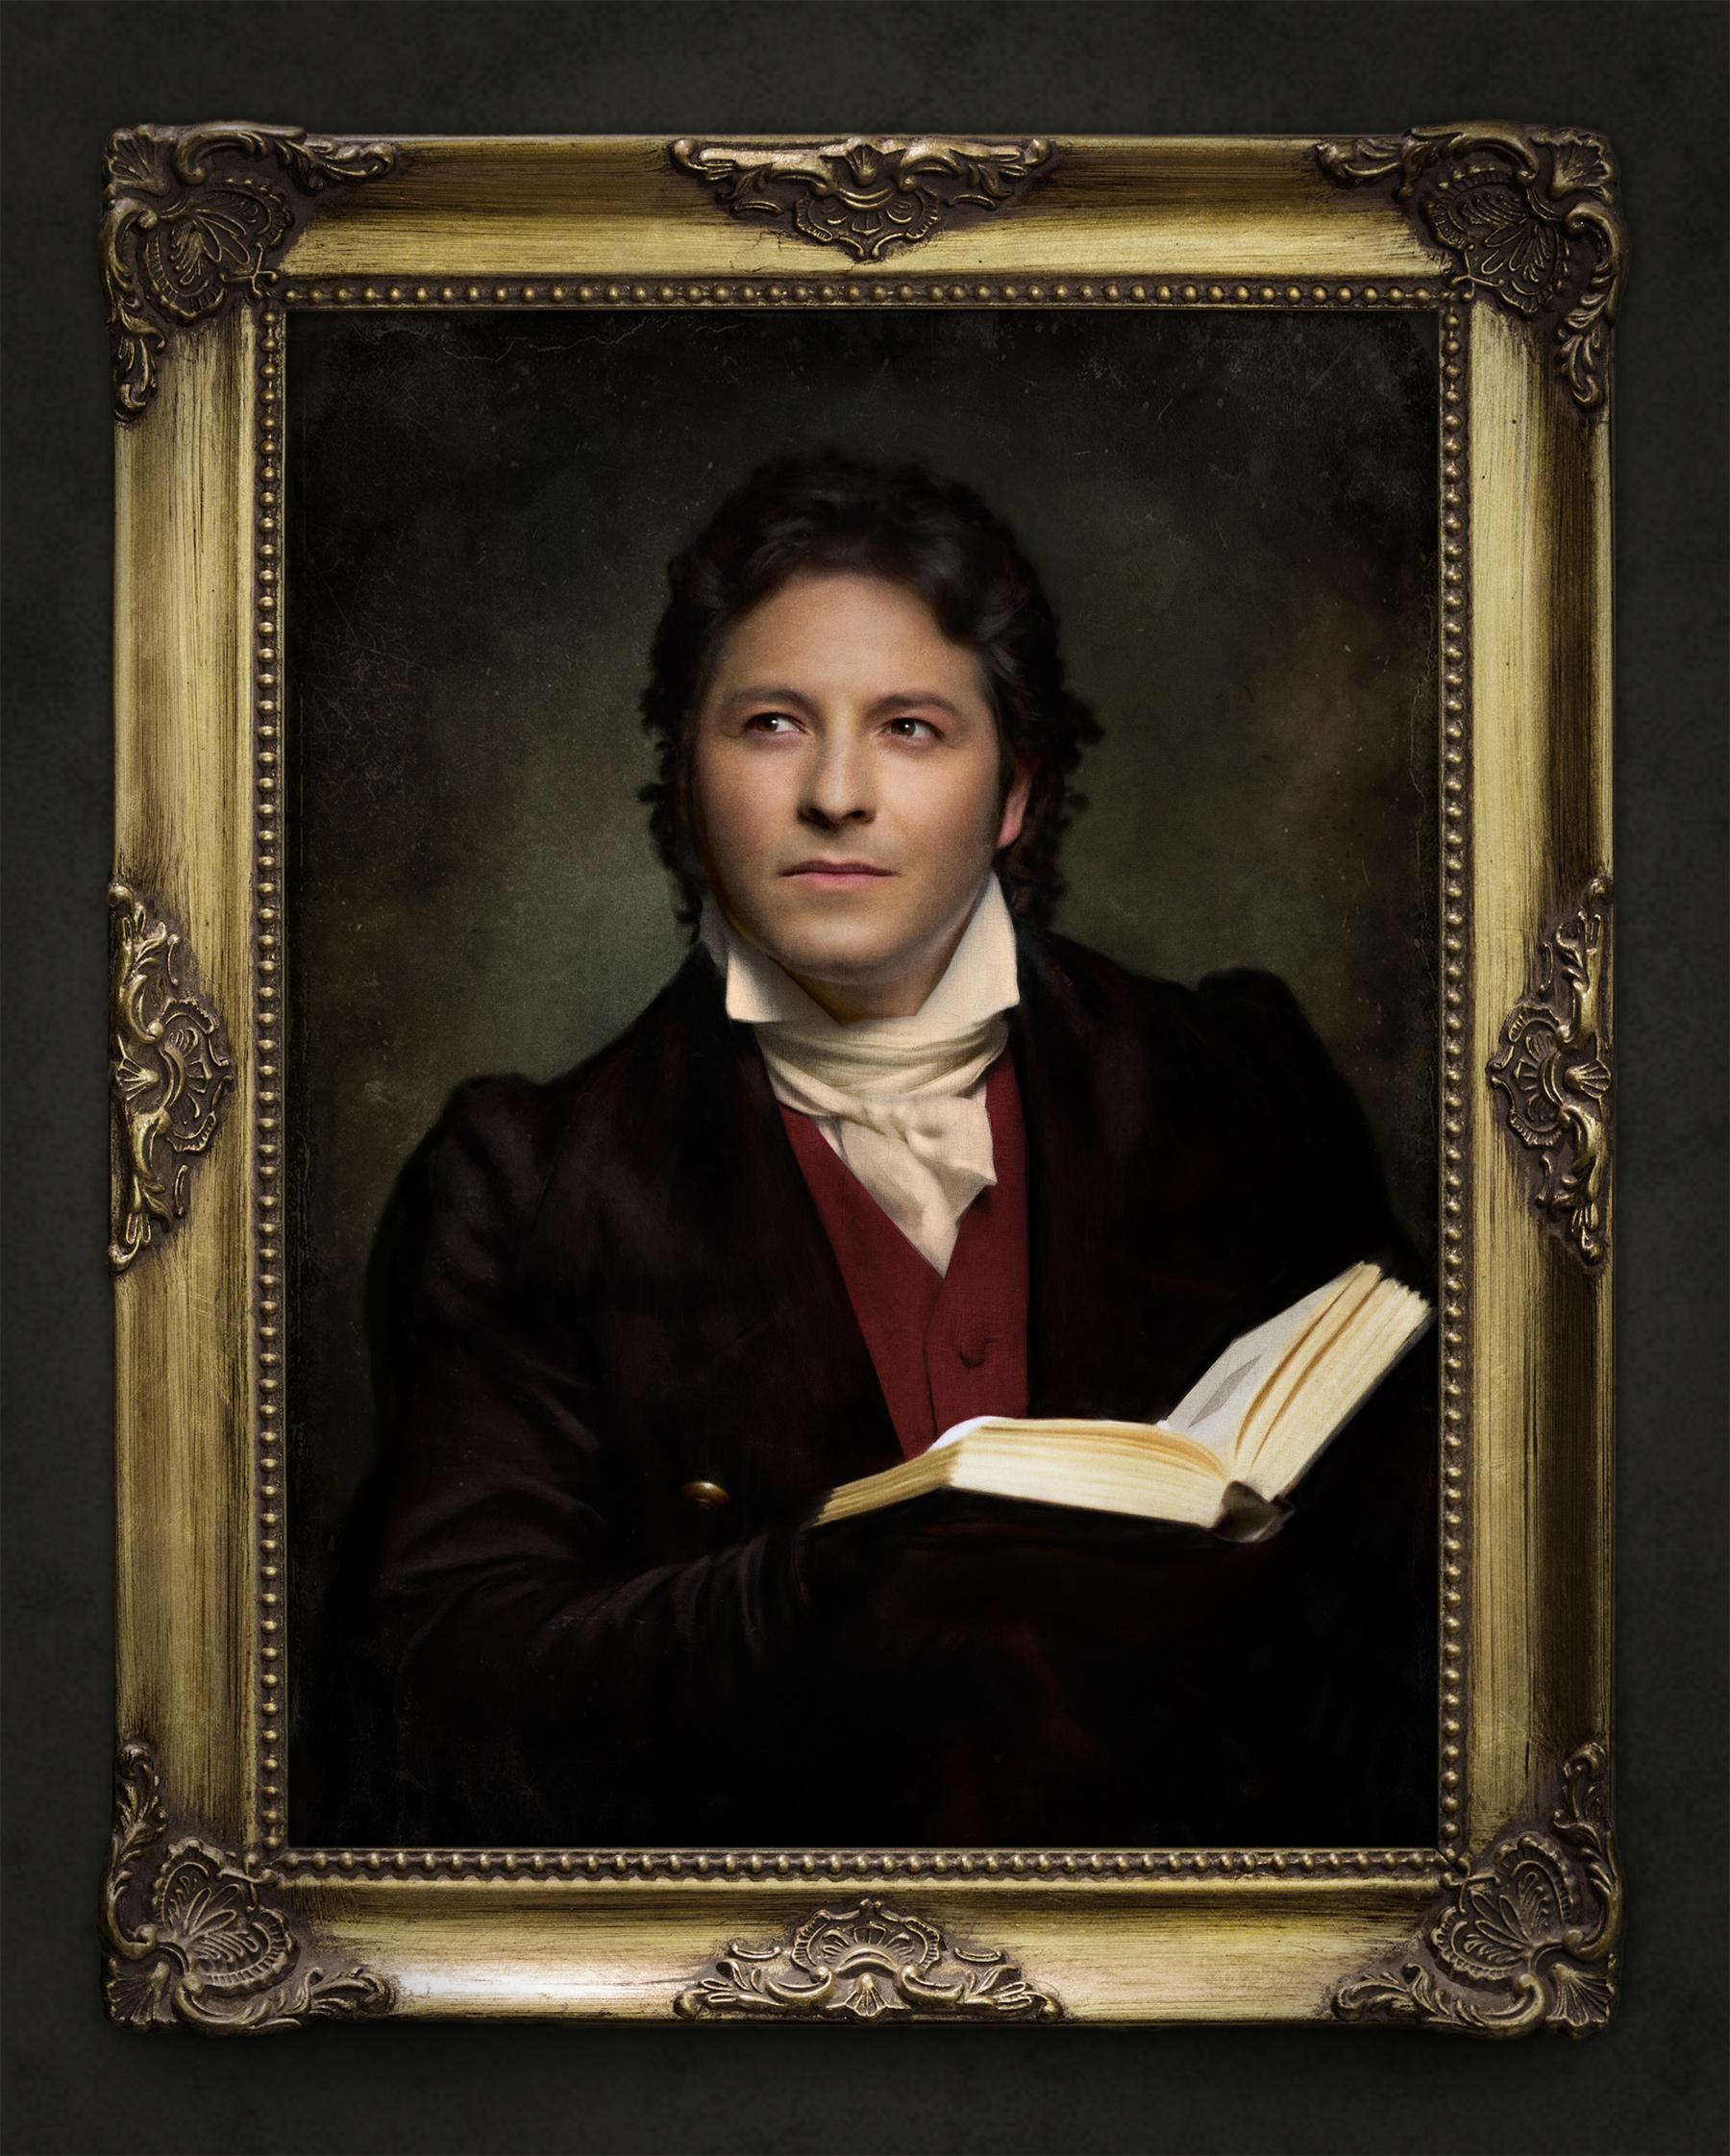 Diego Saavedra tenor portrait d'art